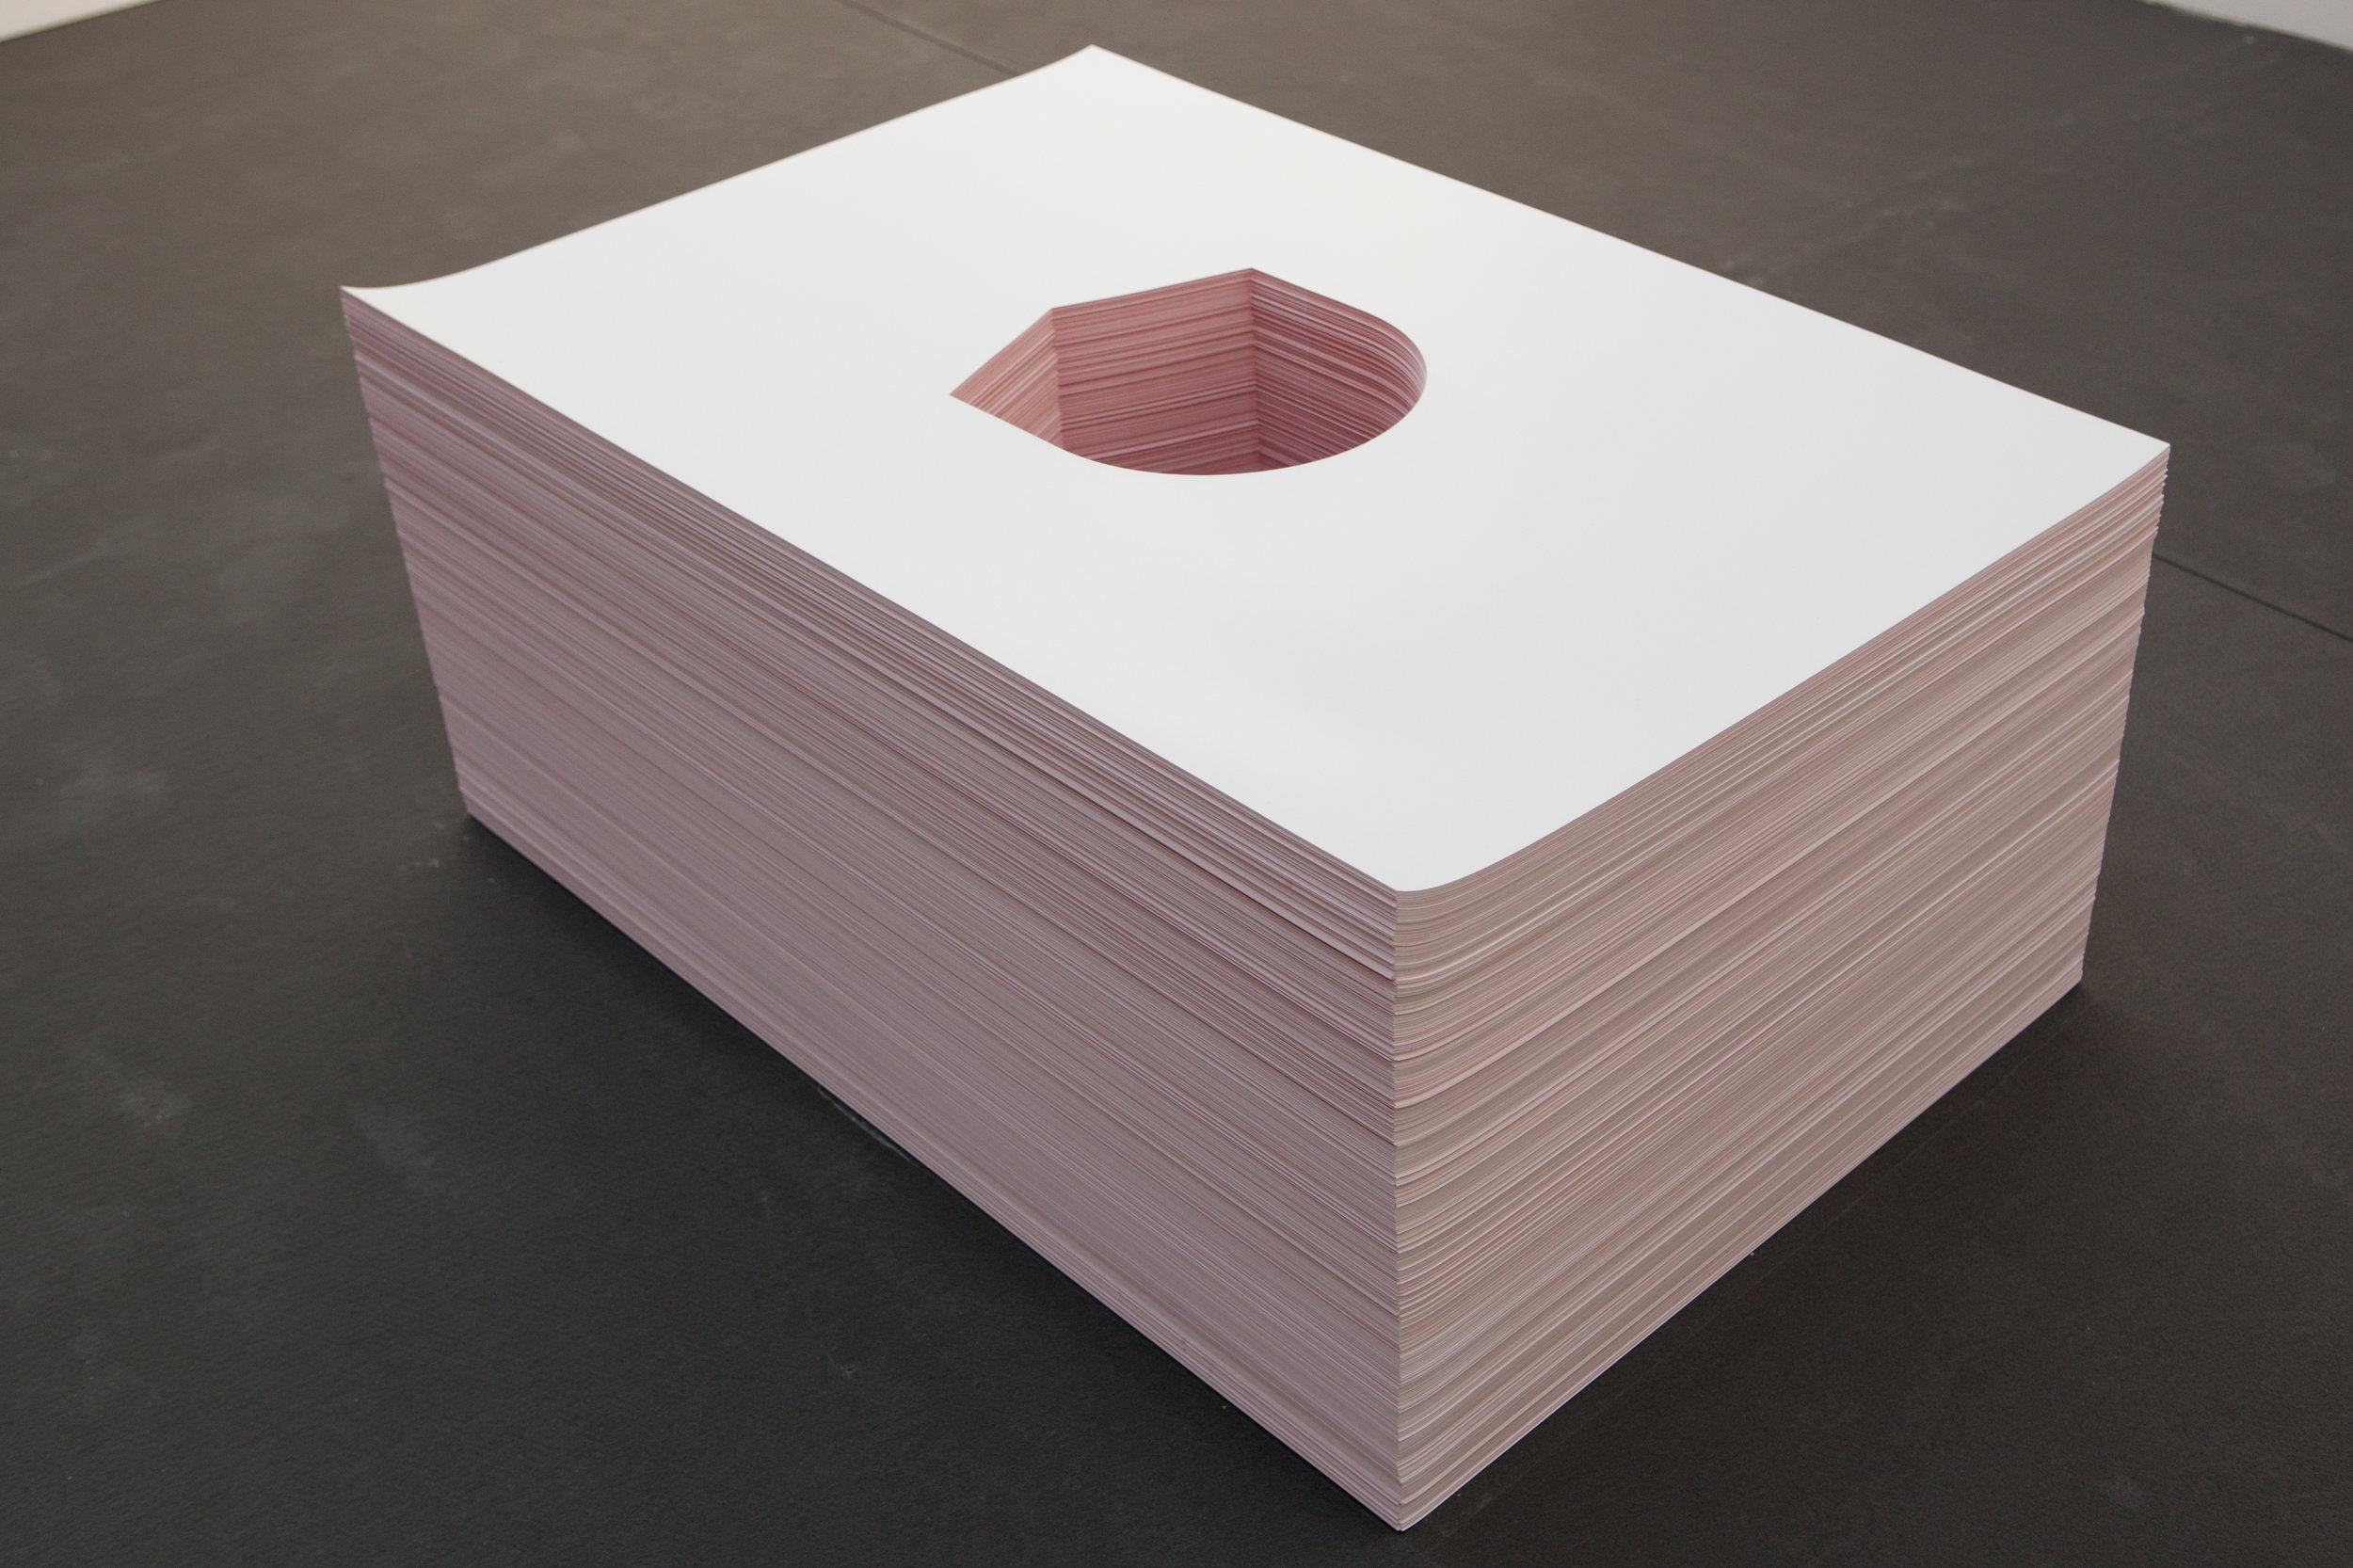 Near Mount Rainer, 2011 1500 offset prints 70 x 100 x 70 cm - 27 1/2 x 39 3/8 x 27 1/2 inches